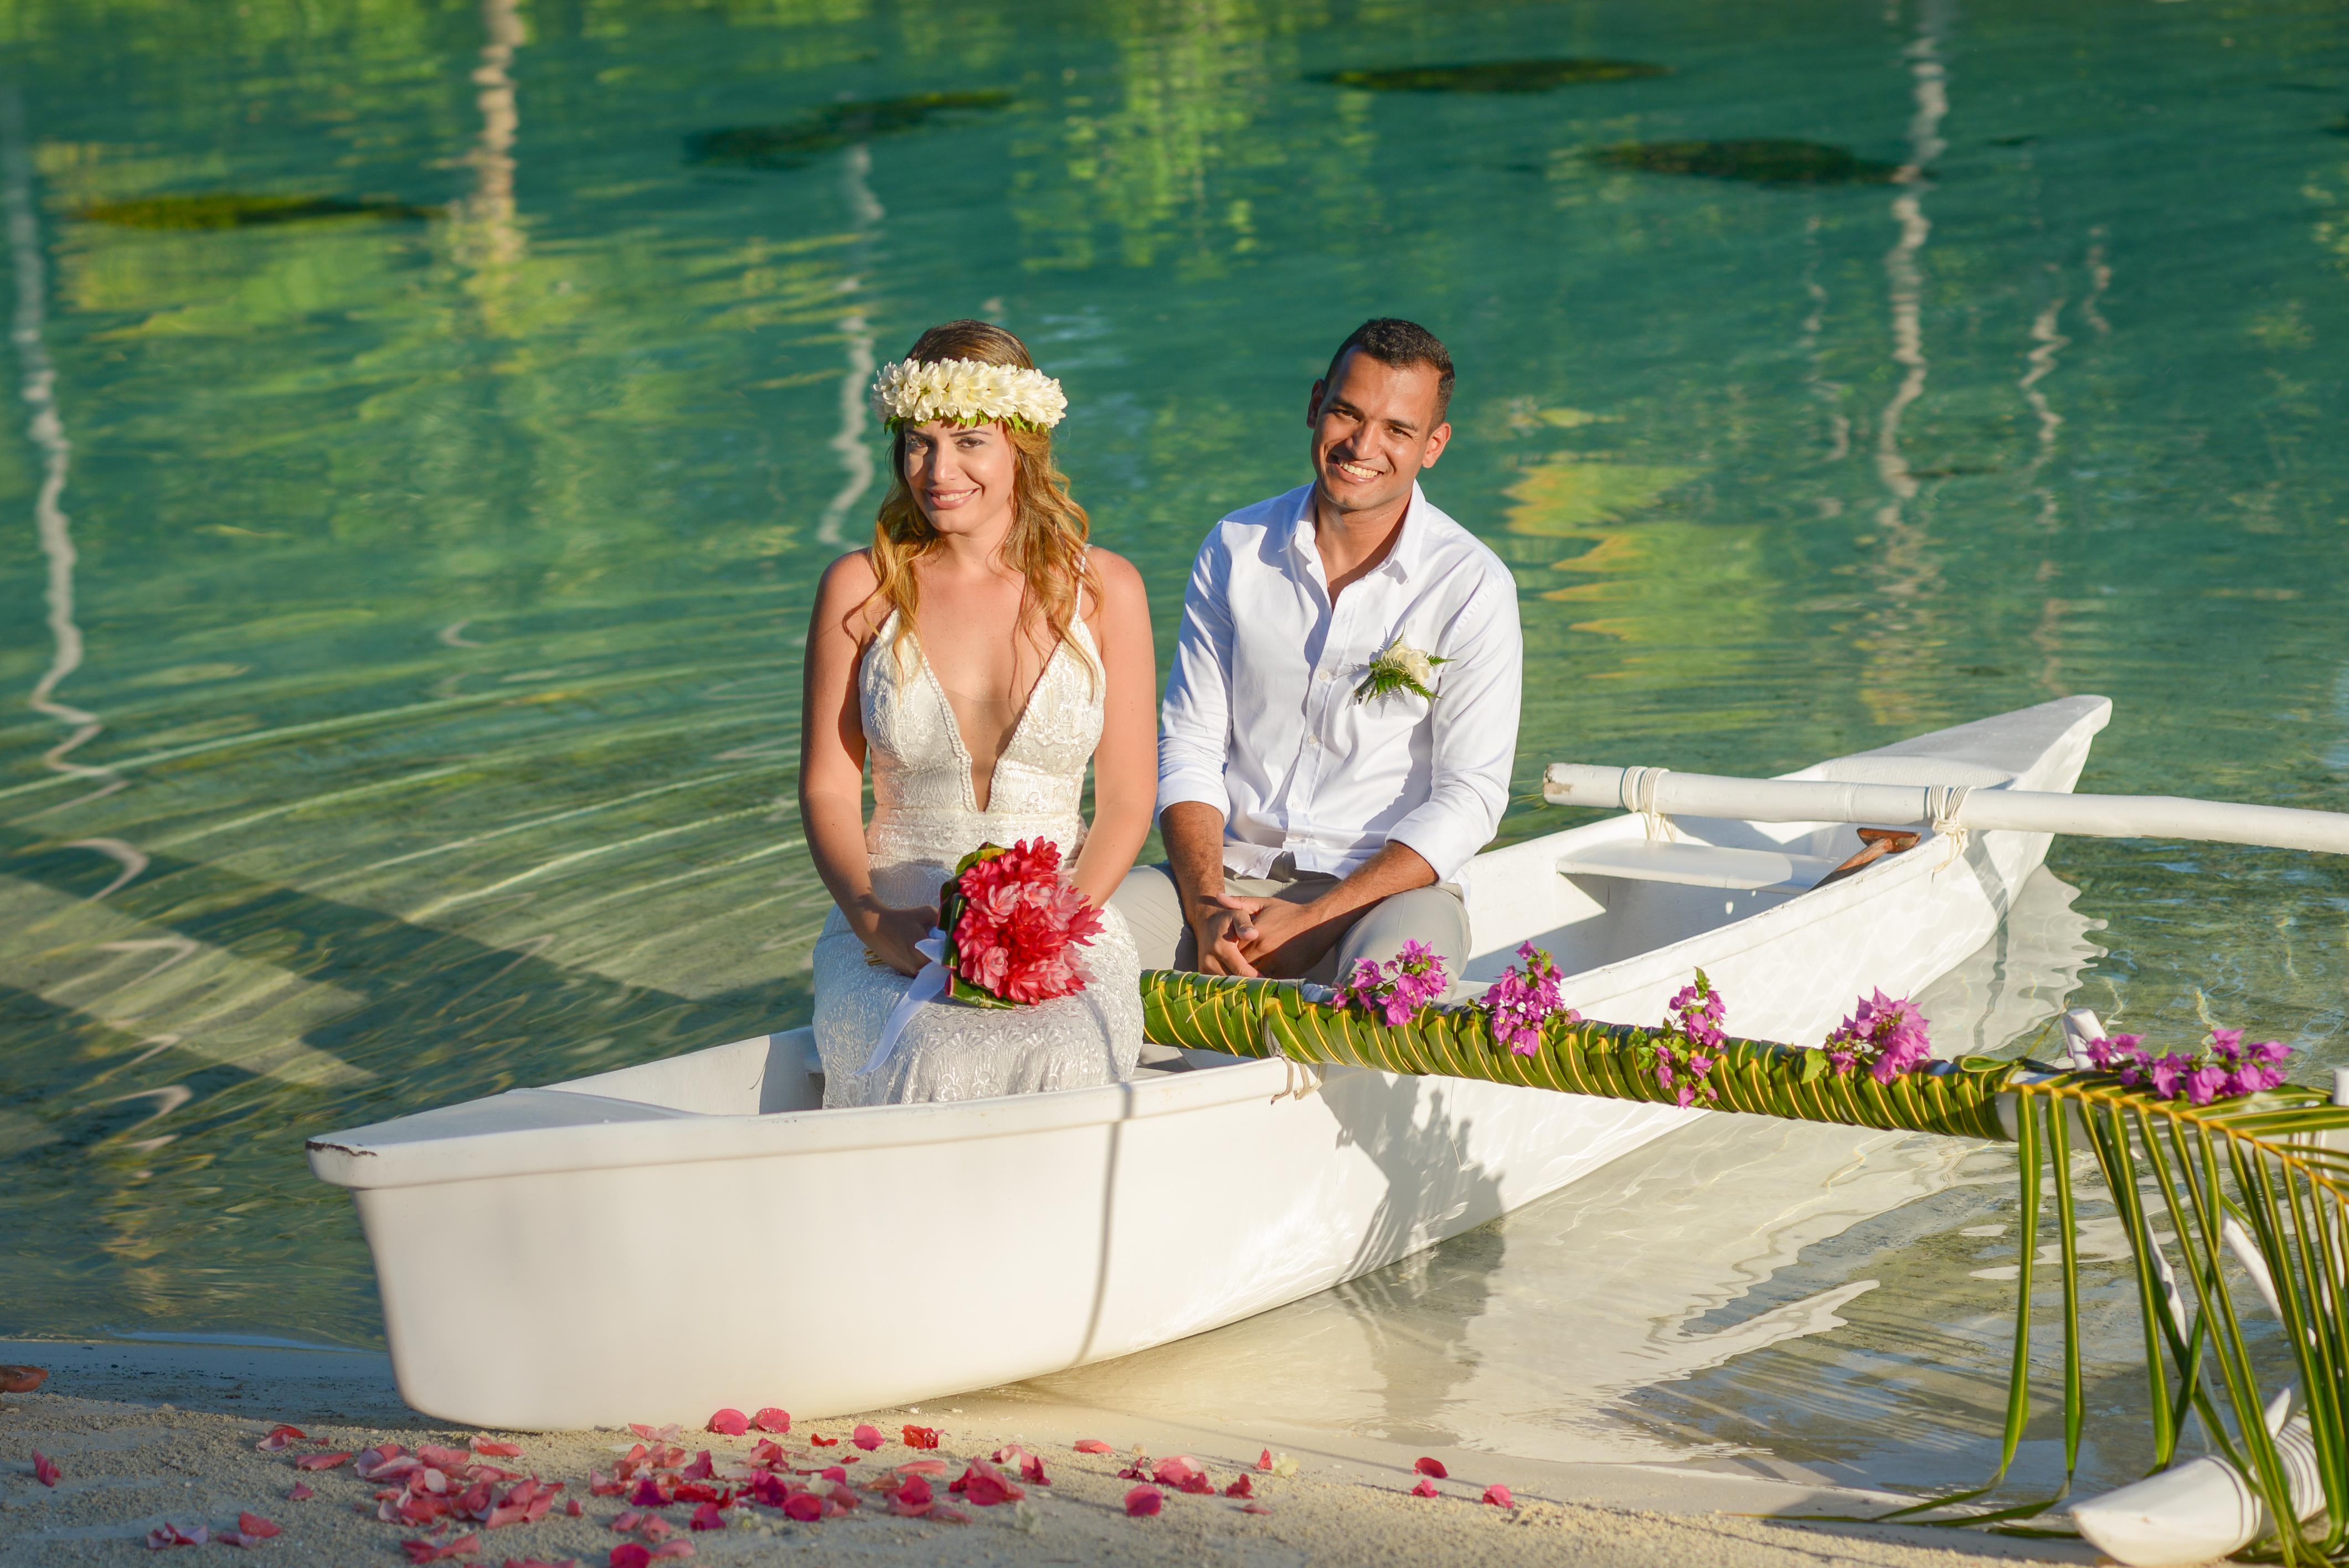 Lua de Mel Bora Bora - Cerimônia de Casamento Tradicional na Praia Intercontinental Bora Bora Thalasso - Canoa Taitiana Bora Bora